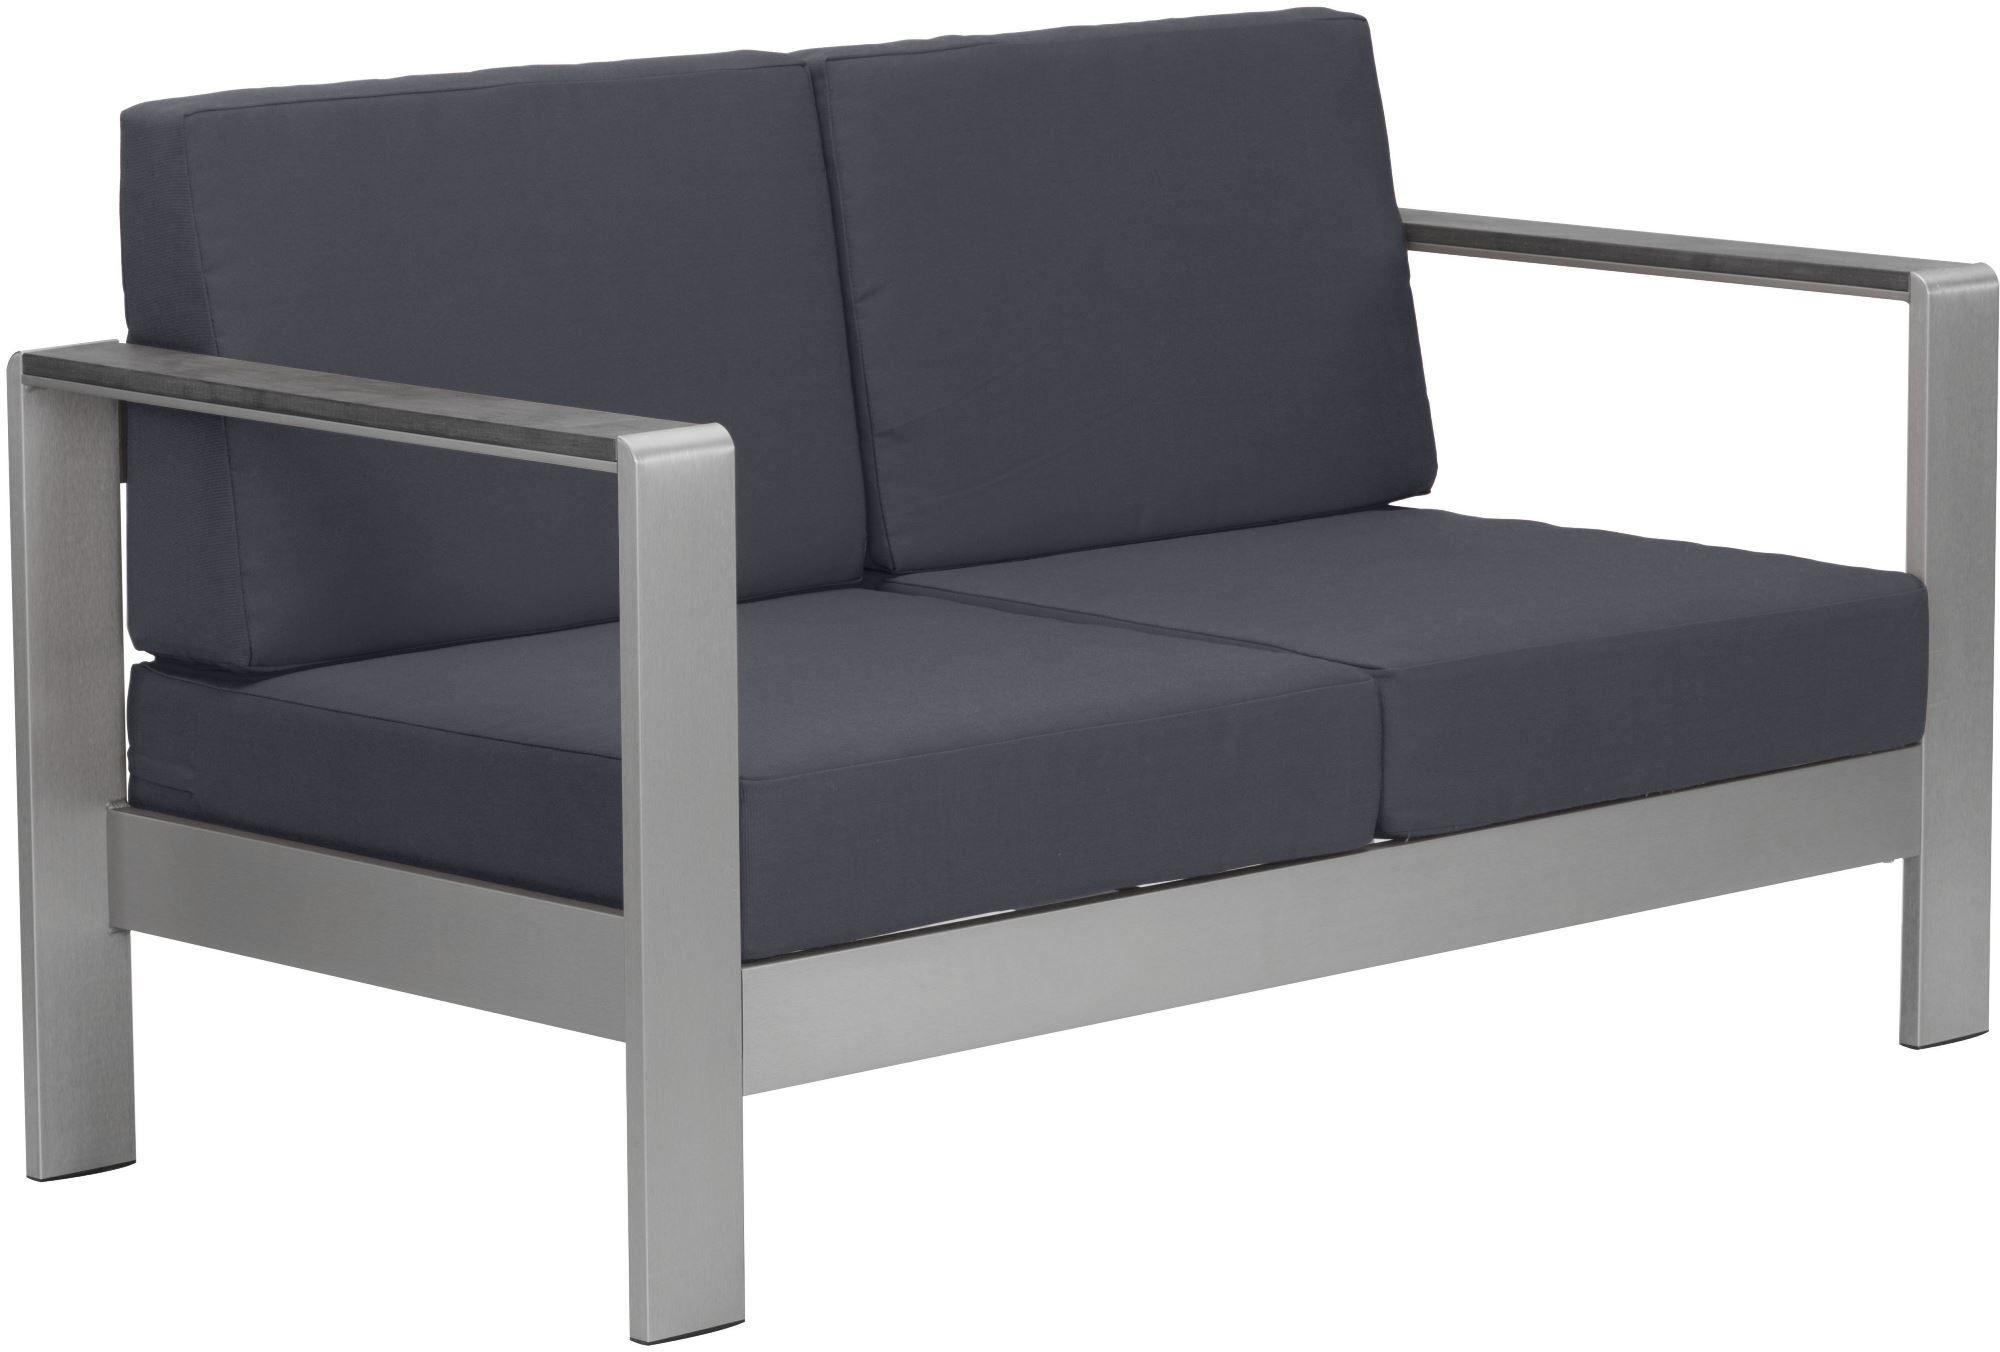 Cosmopolitan Dark Gray Sofa Cushions From Zuo Coleman